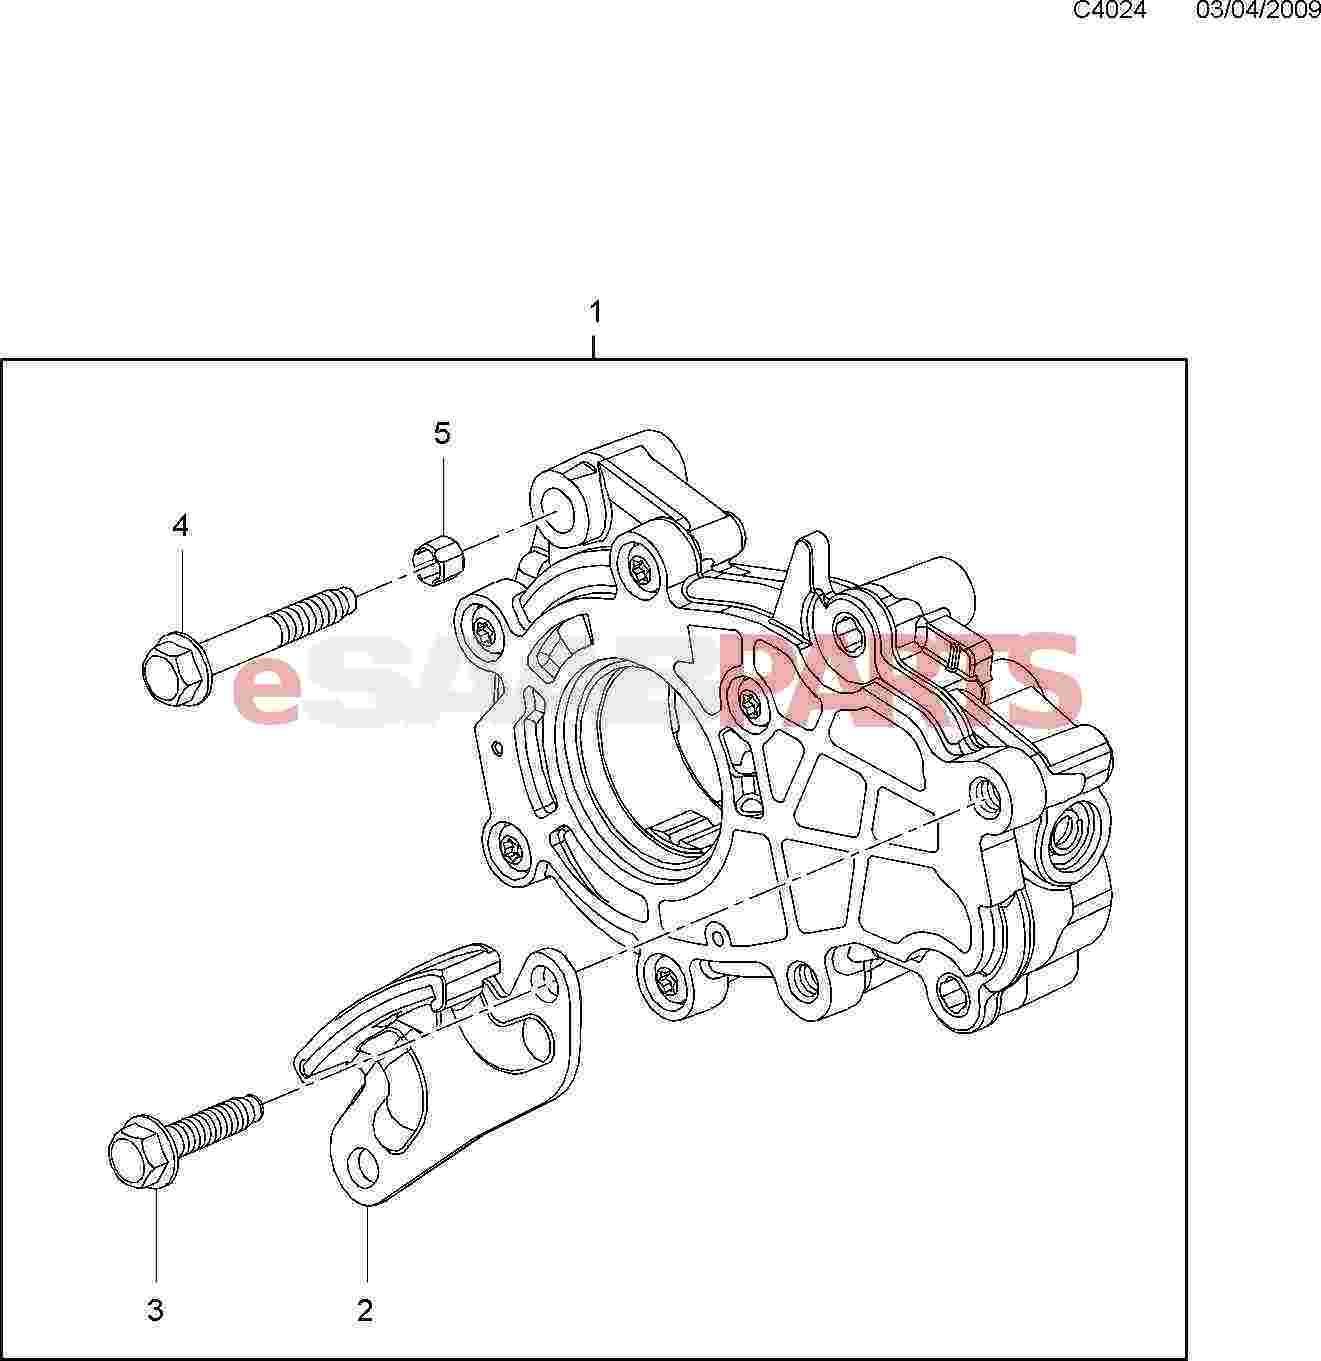 Nissan Manual Transmission Diagram - Wiring Diagrams Schema